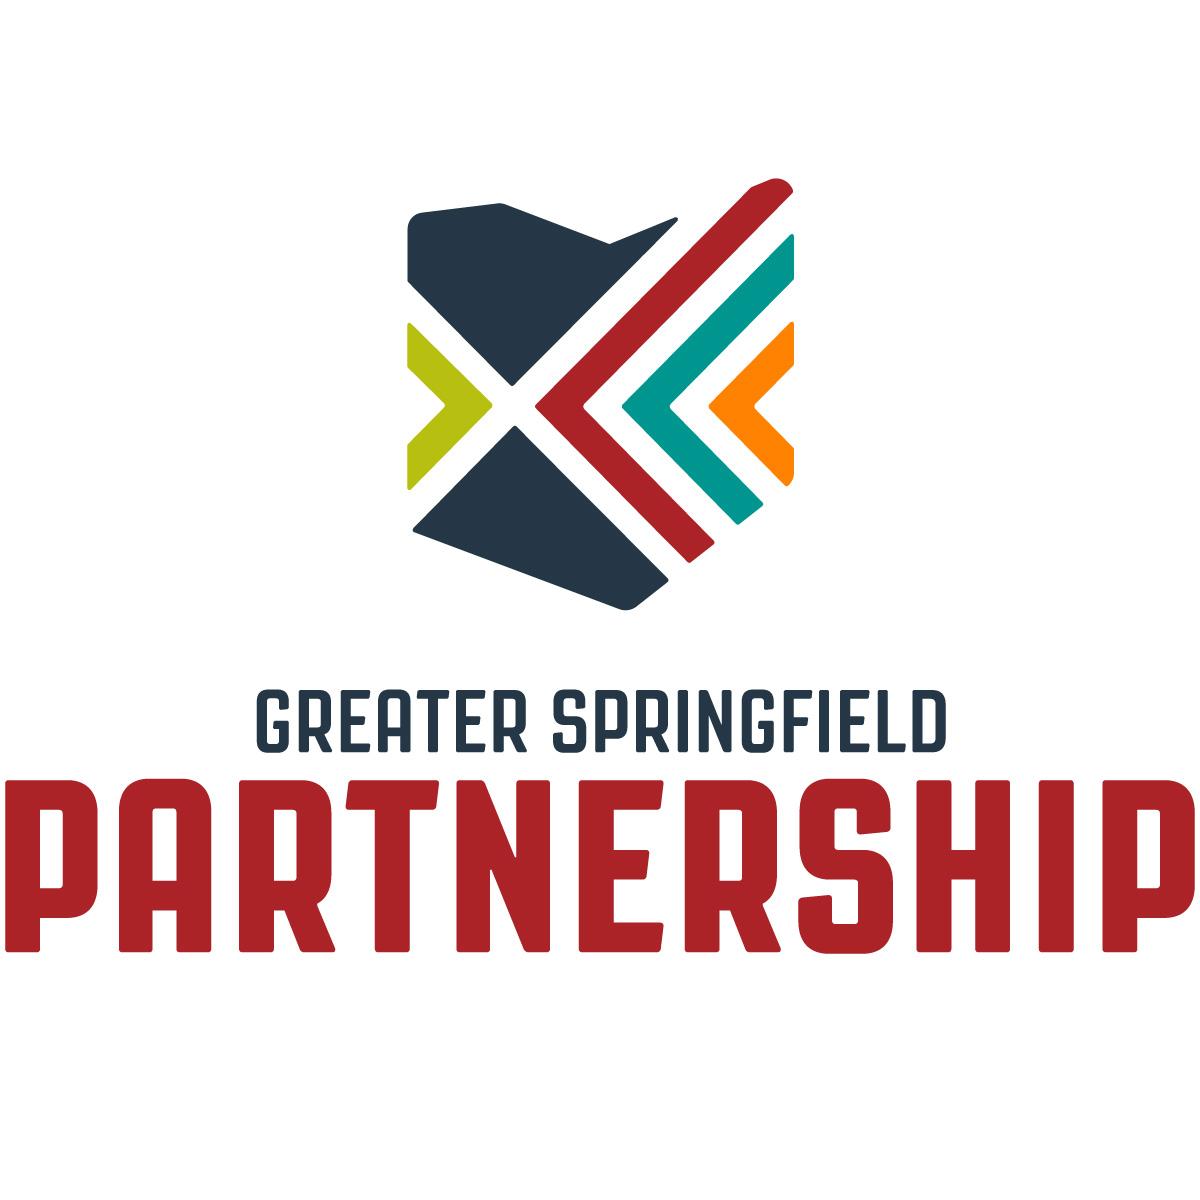 Greater Springfield Partnership